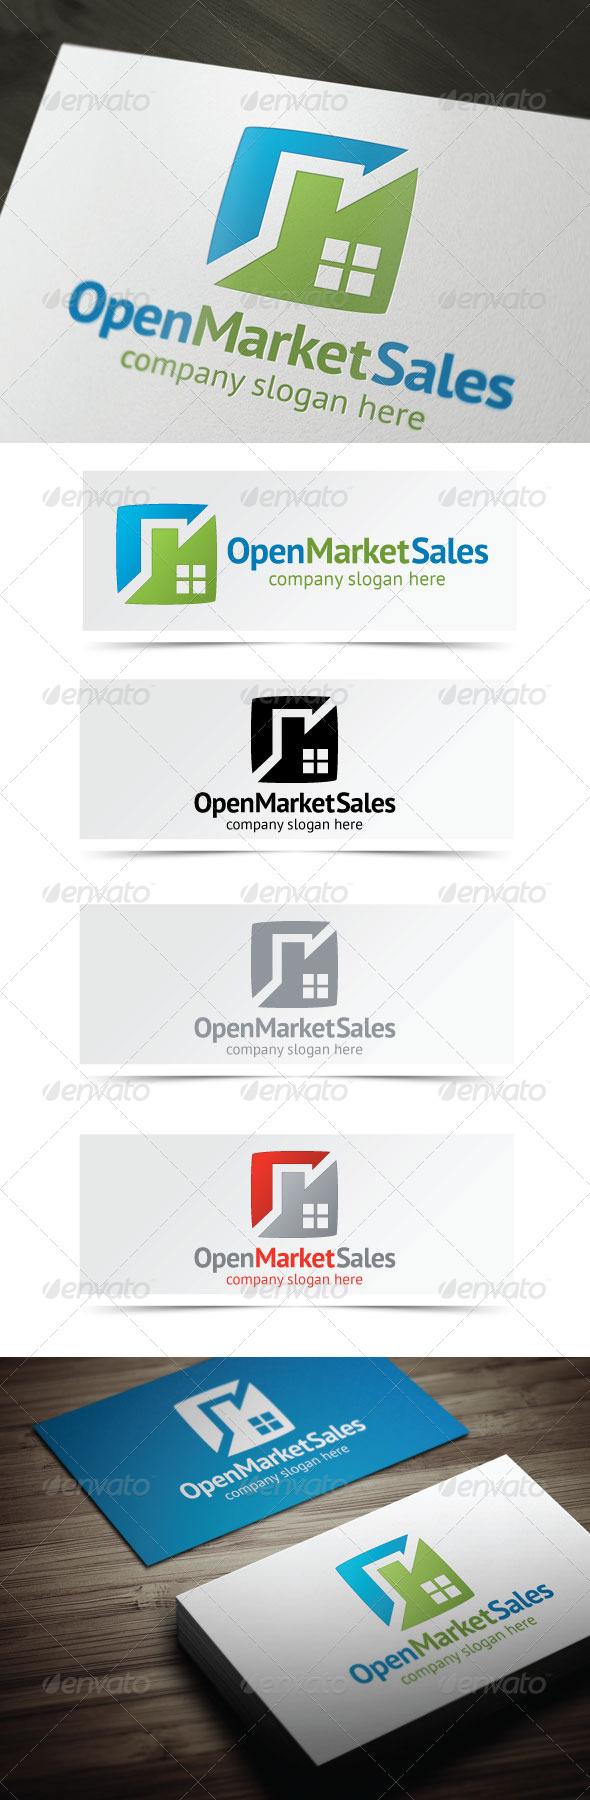 GraphicRiver Open Market Sales 4177368